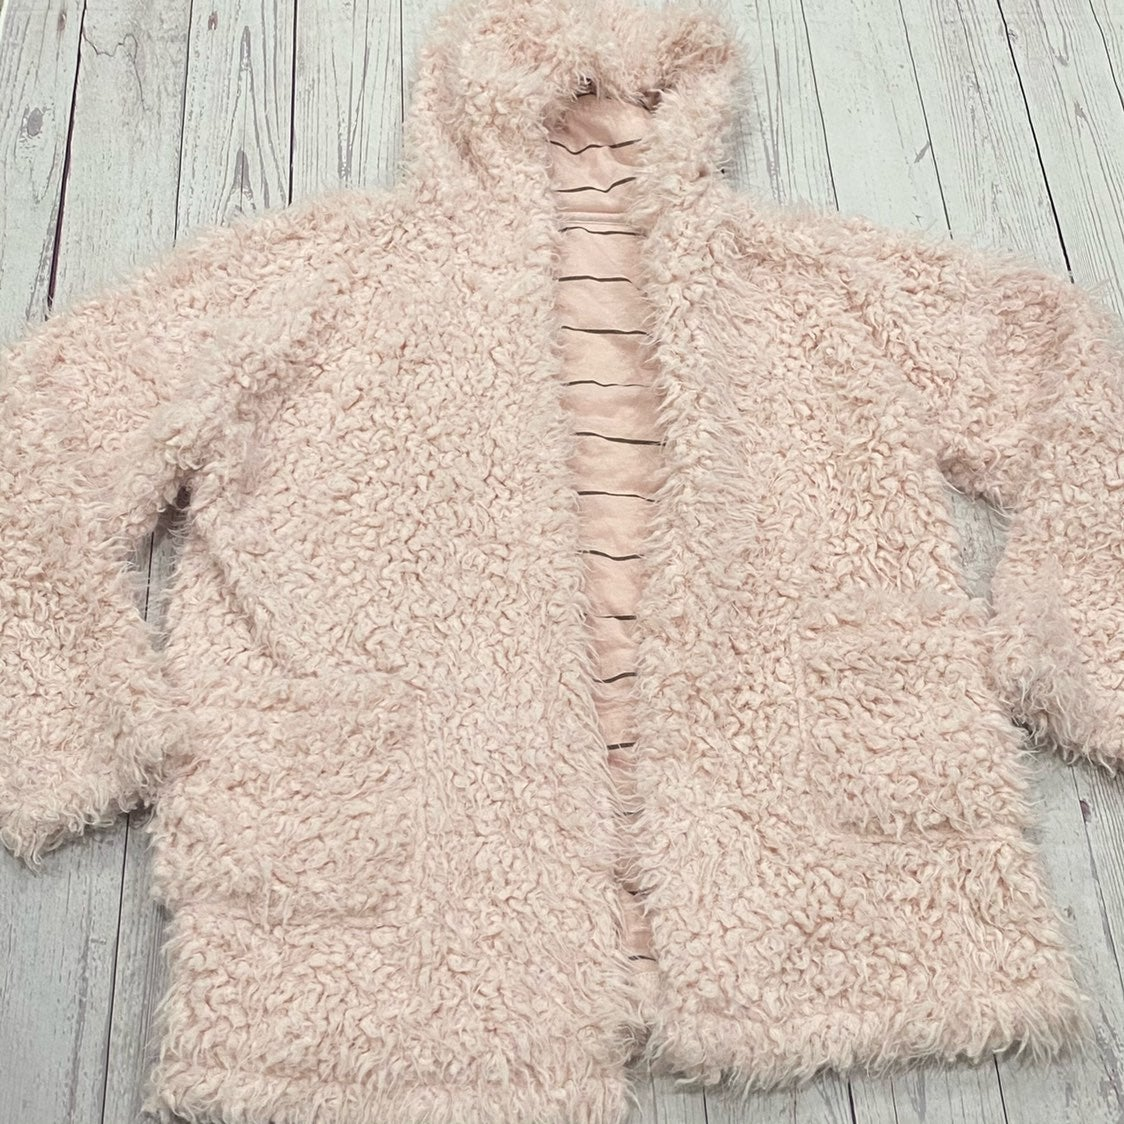 Splendid Pink Hooded Teddy Jacket